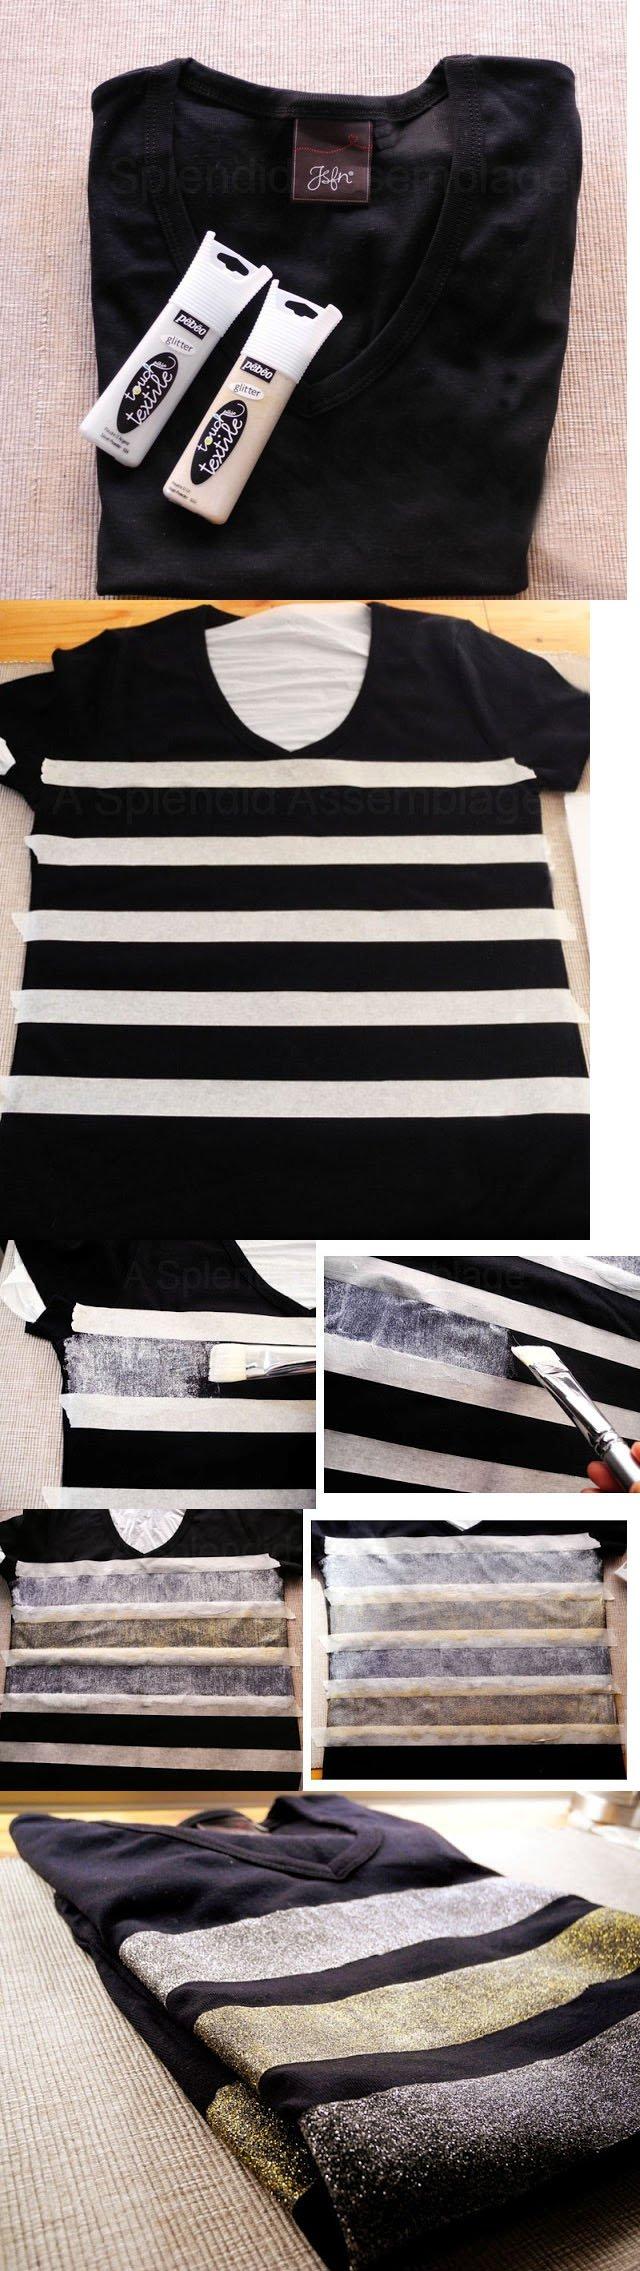 Clothing Tutorials DIY blouse